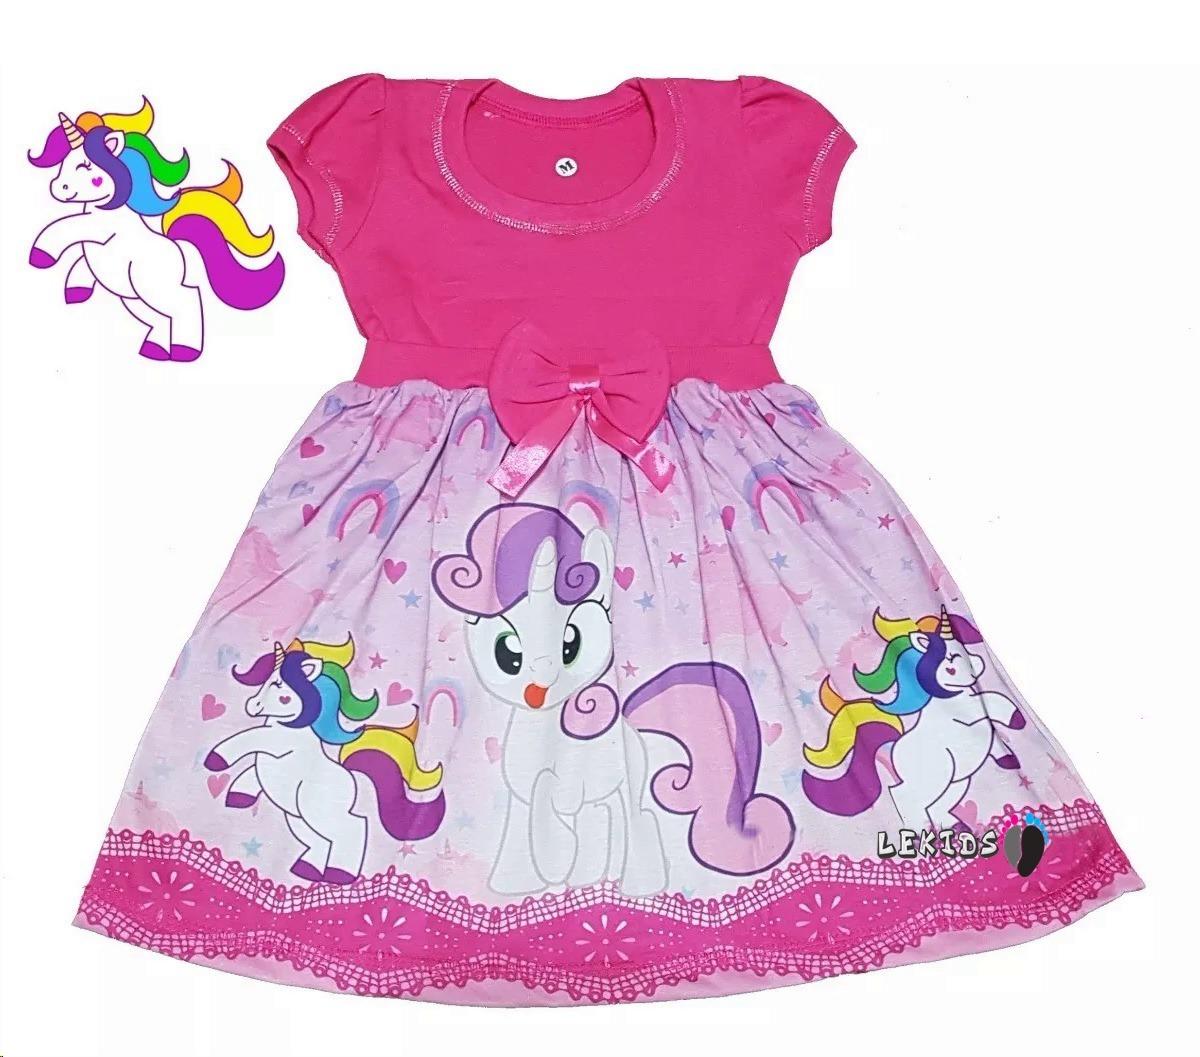 Vestido Infantil Tema Unicórnio Rosacriançaaniversário R 3900